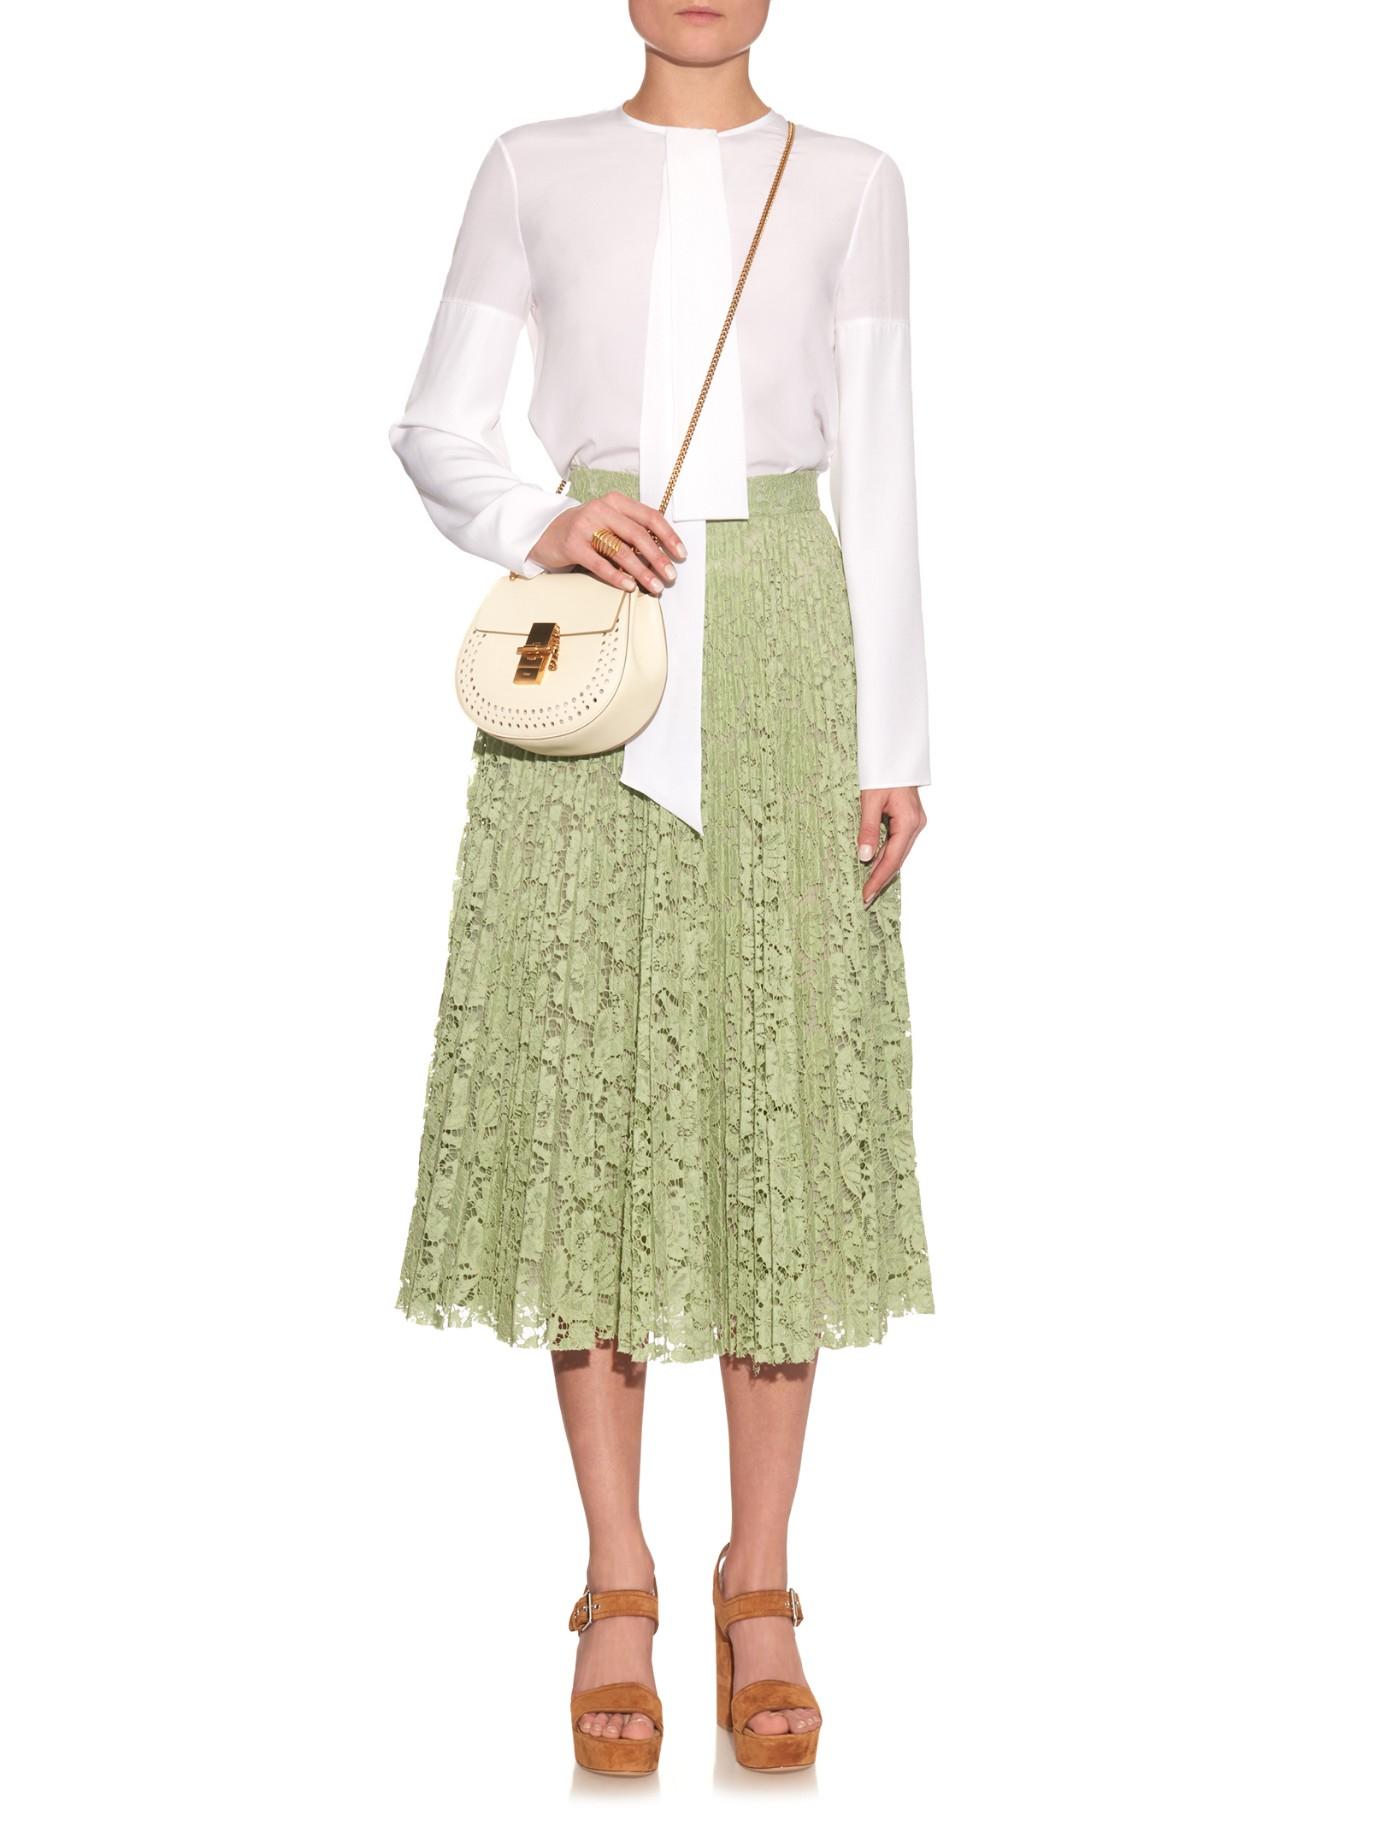 chloe replica handbag - chloe women\u0026#39;s drew mini-crossbody, white chloe bag